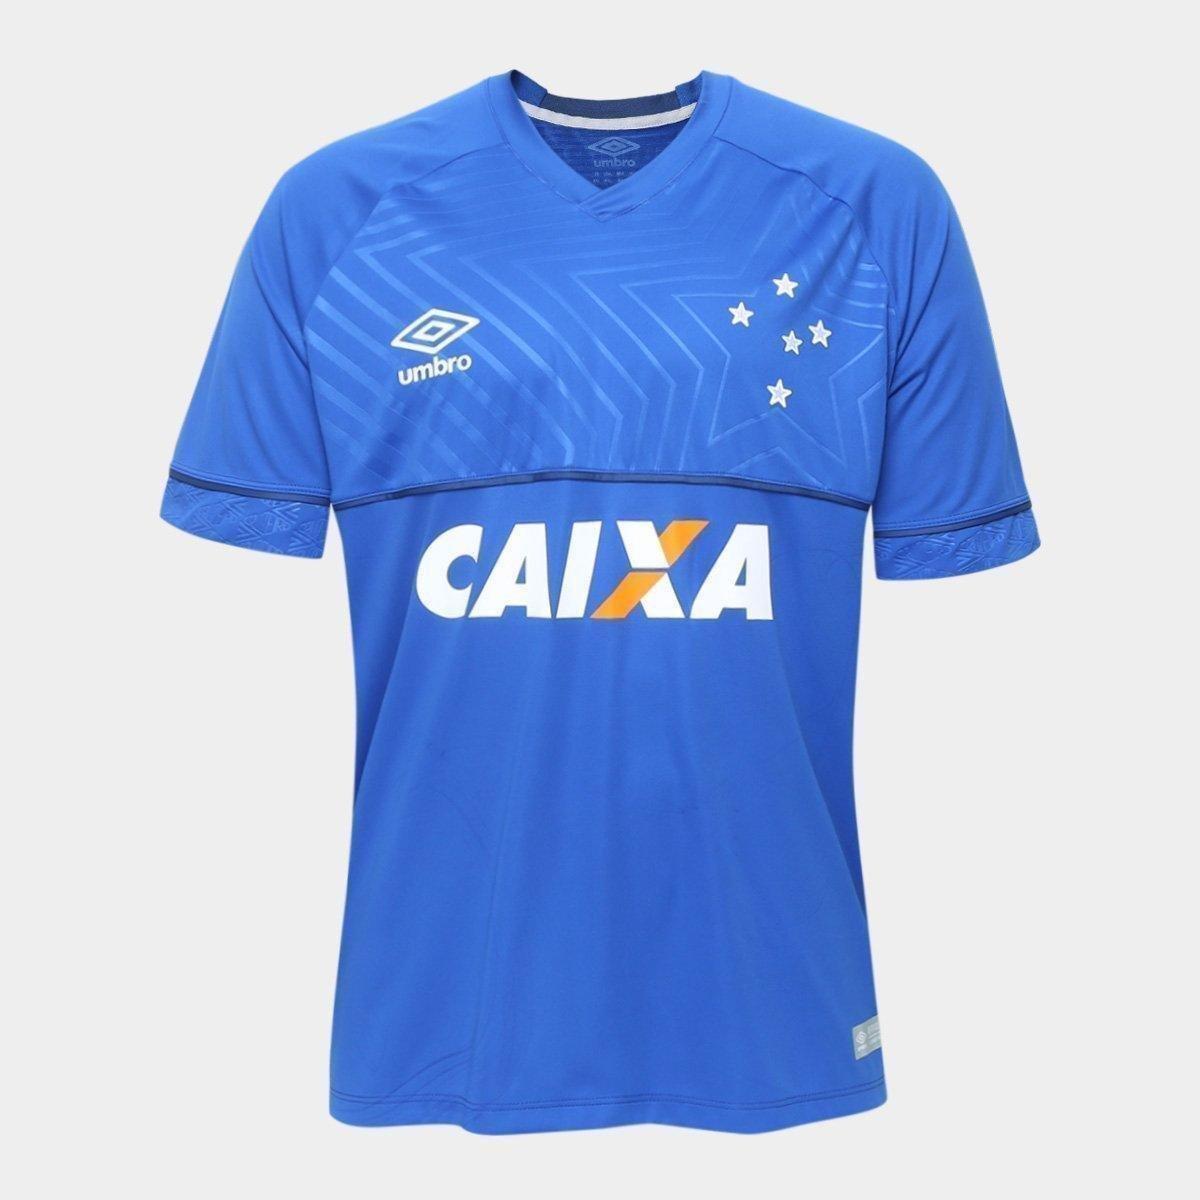 5c35fe6d0775a Camisa Cruzeiro I 18 19 s n° - Jogador Umbro Masculina